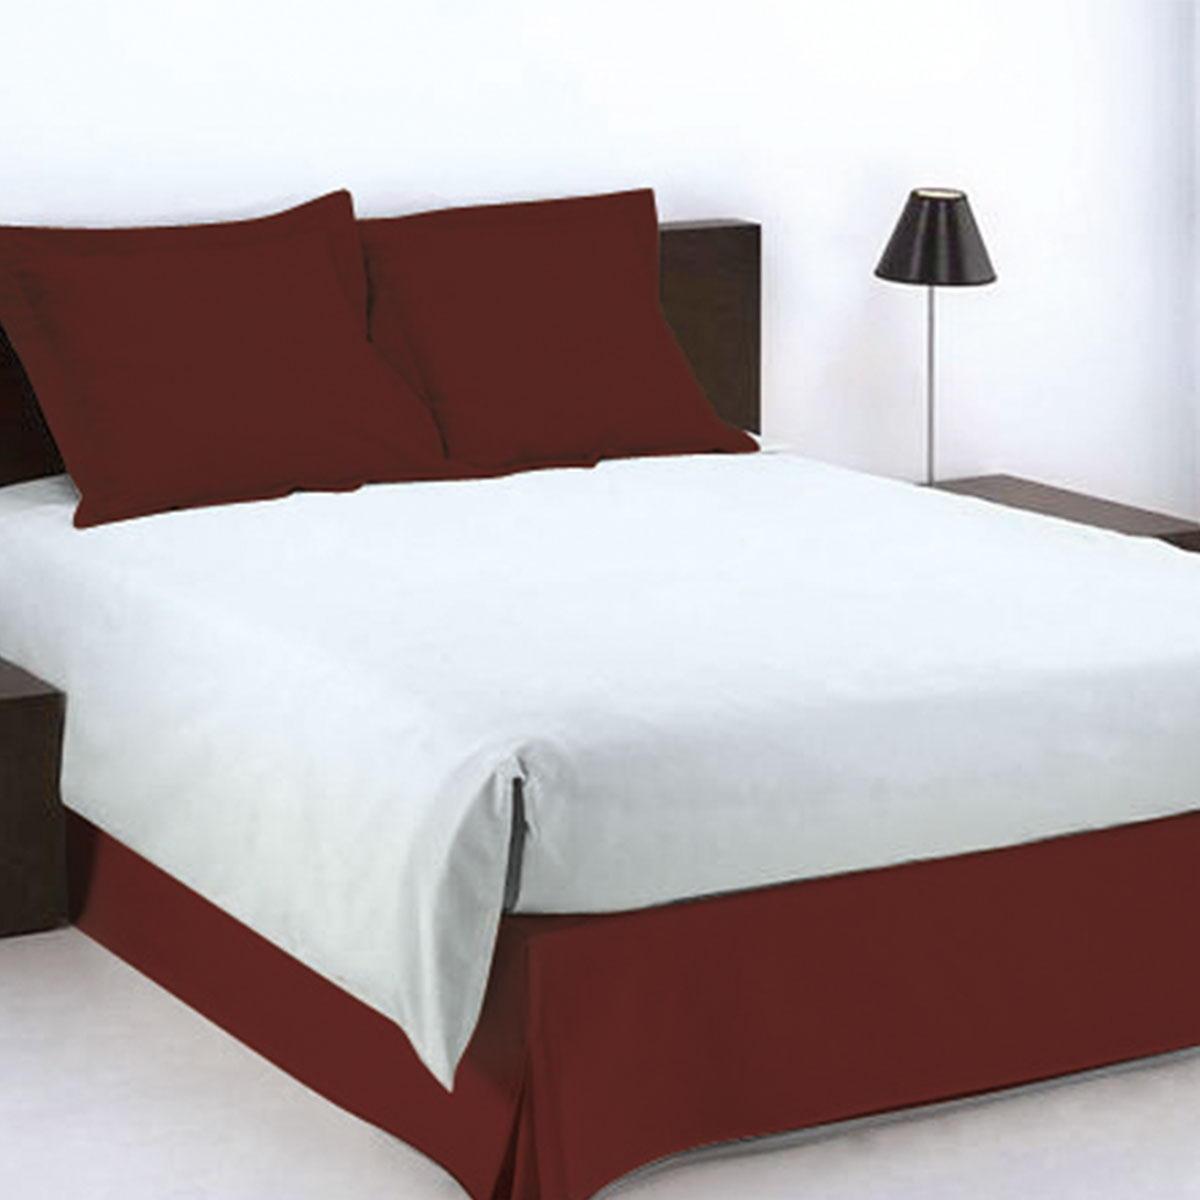 cache sommier lin cool gallery of cache sommier lincoton touril laredoute collection avec la. Black Bedroom Furniture Sets. Home Design Ideas